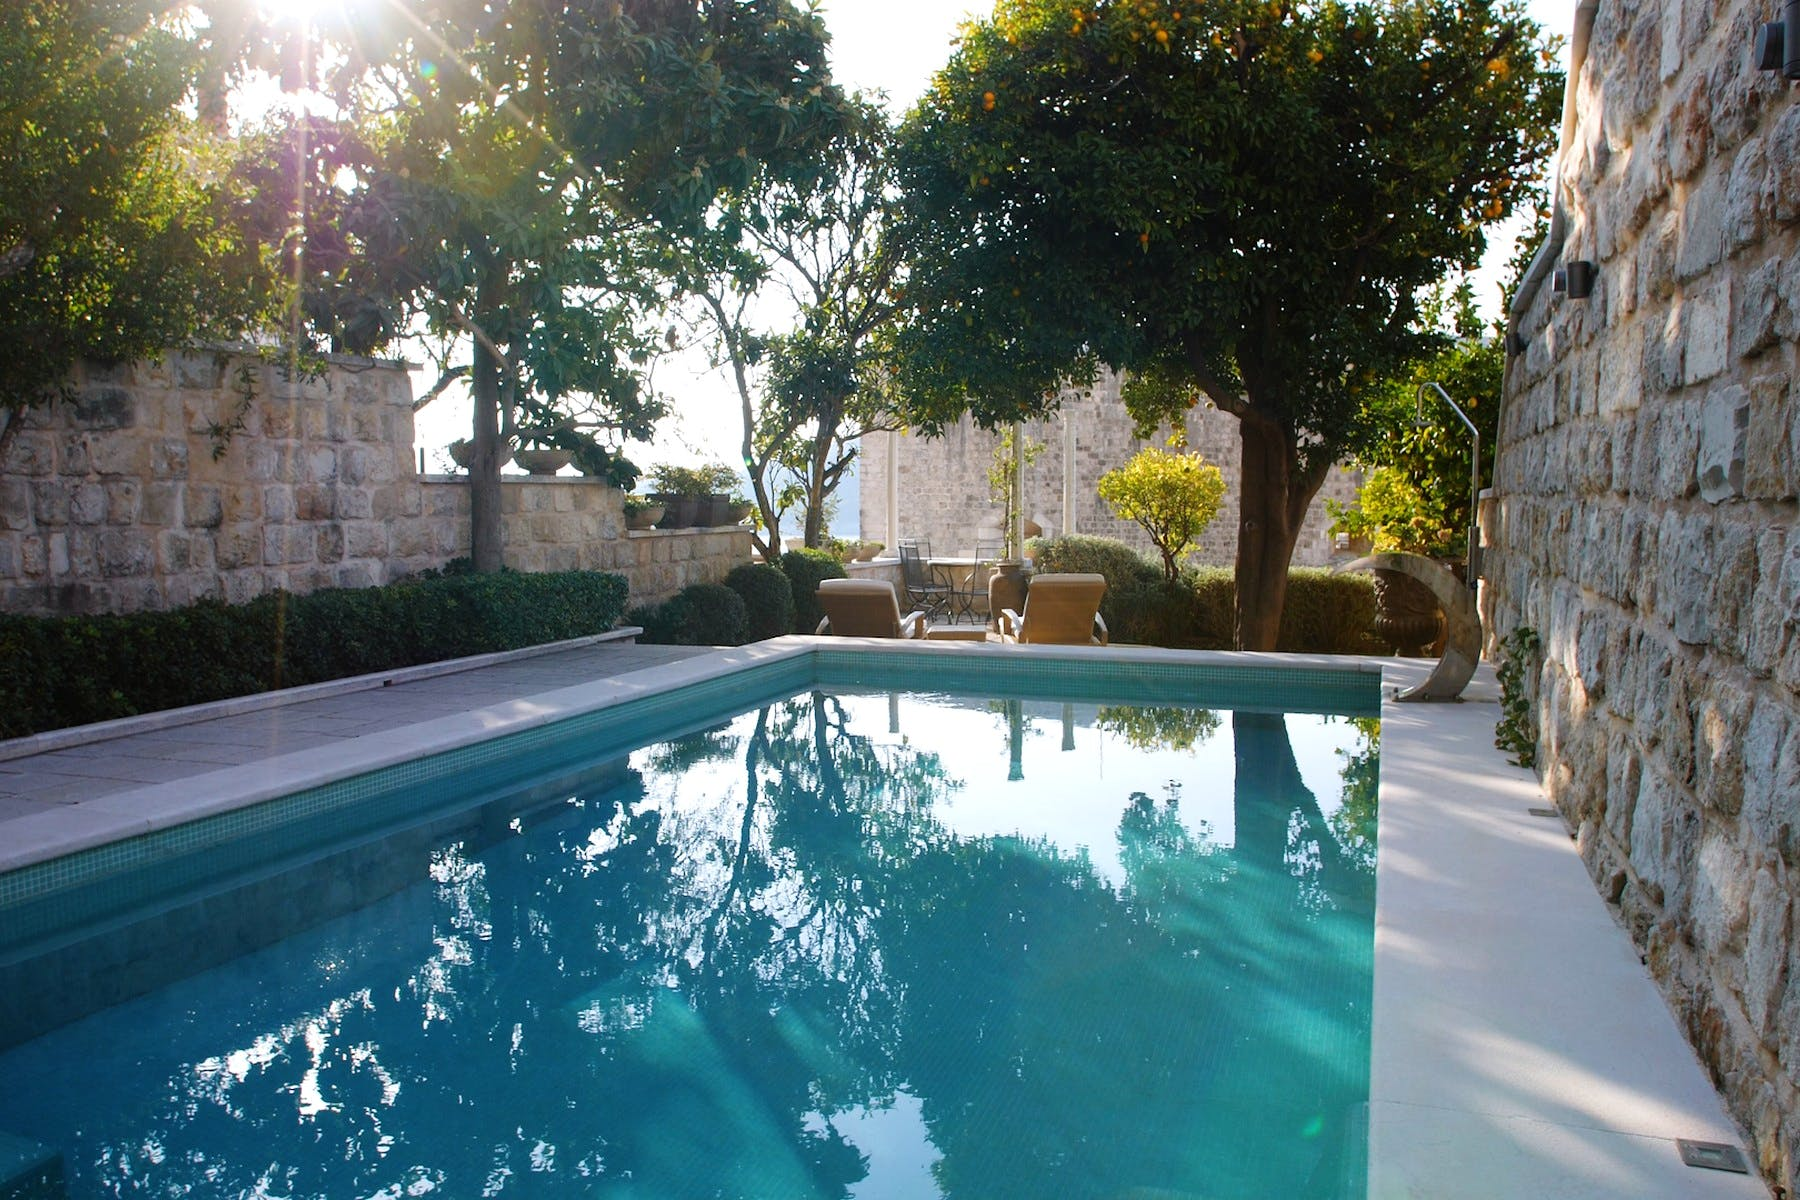 Scenic Mediterranean garden enhanced by pool